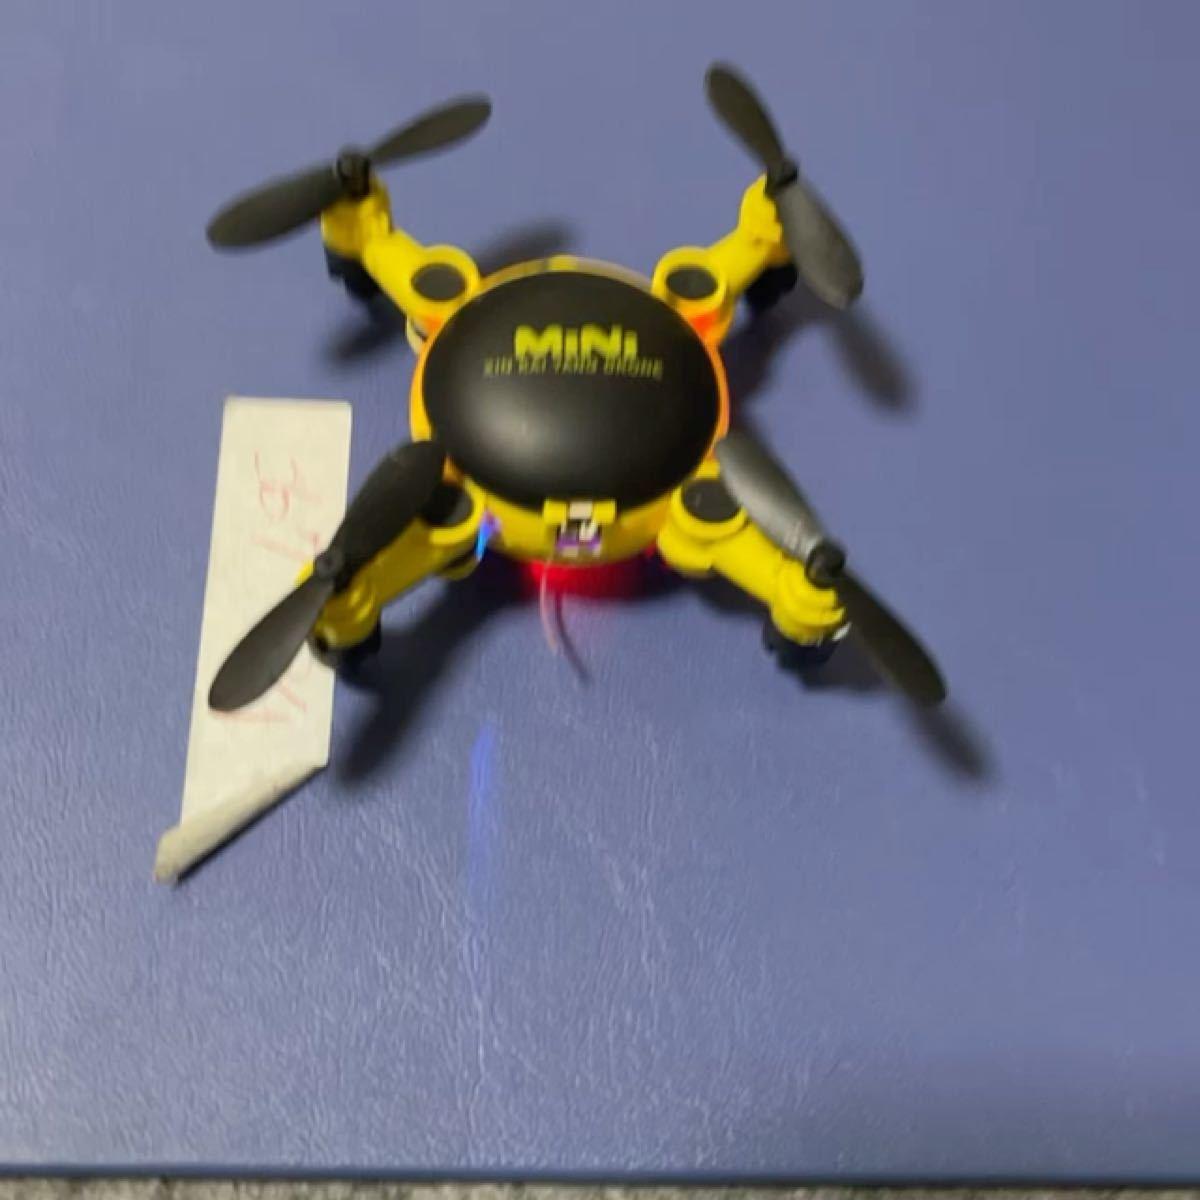 Mini drone ドローンミニカメラ